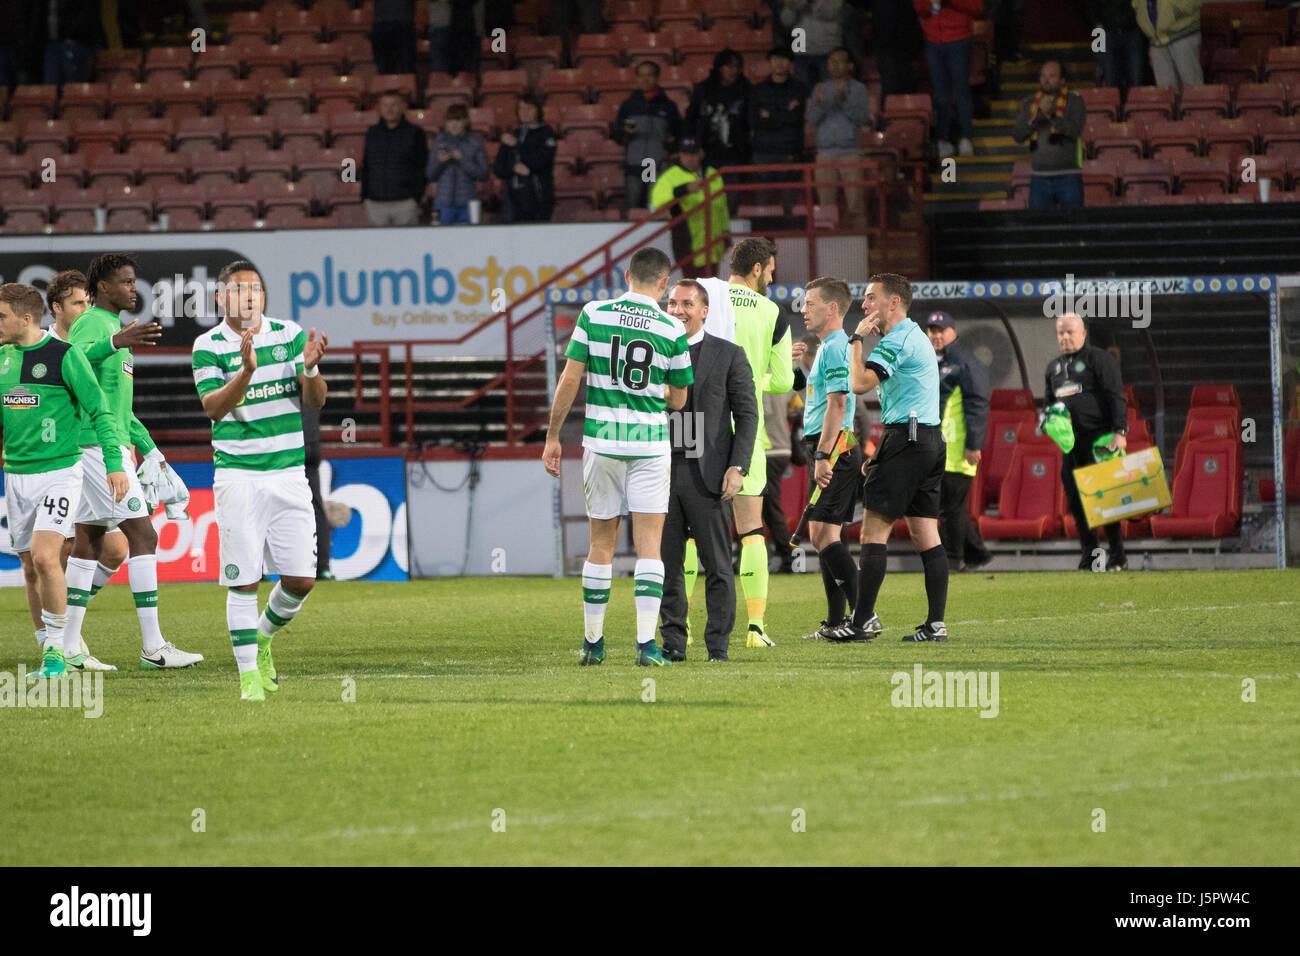 Glasgow, Scotland UK, 18 May 2017, Partick Thistle v Celtic, Firhill Stadium, SPFL Match 5-0. Scottish Premiership - Stock Image